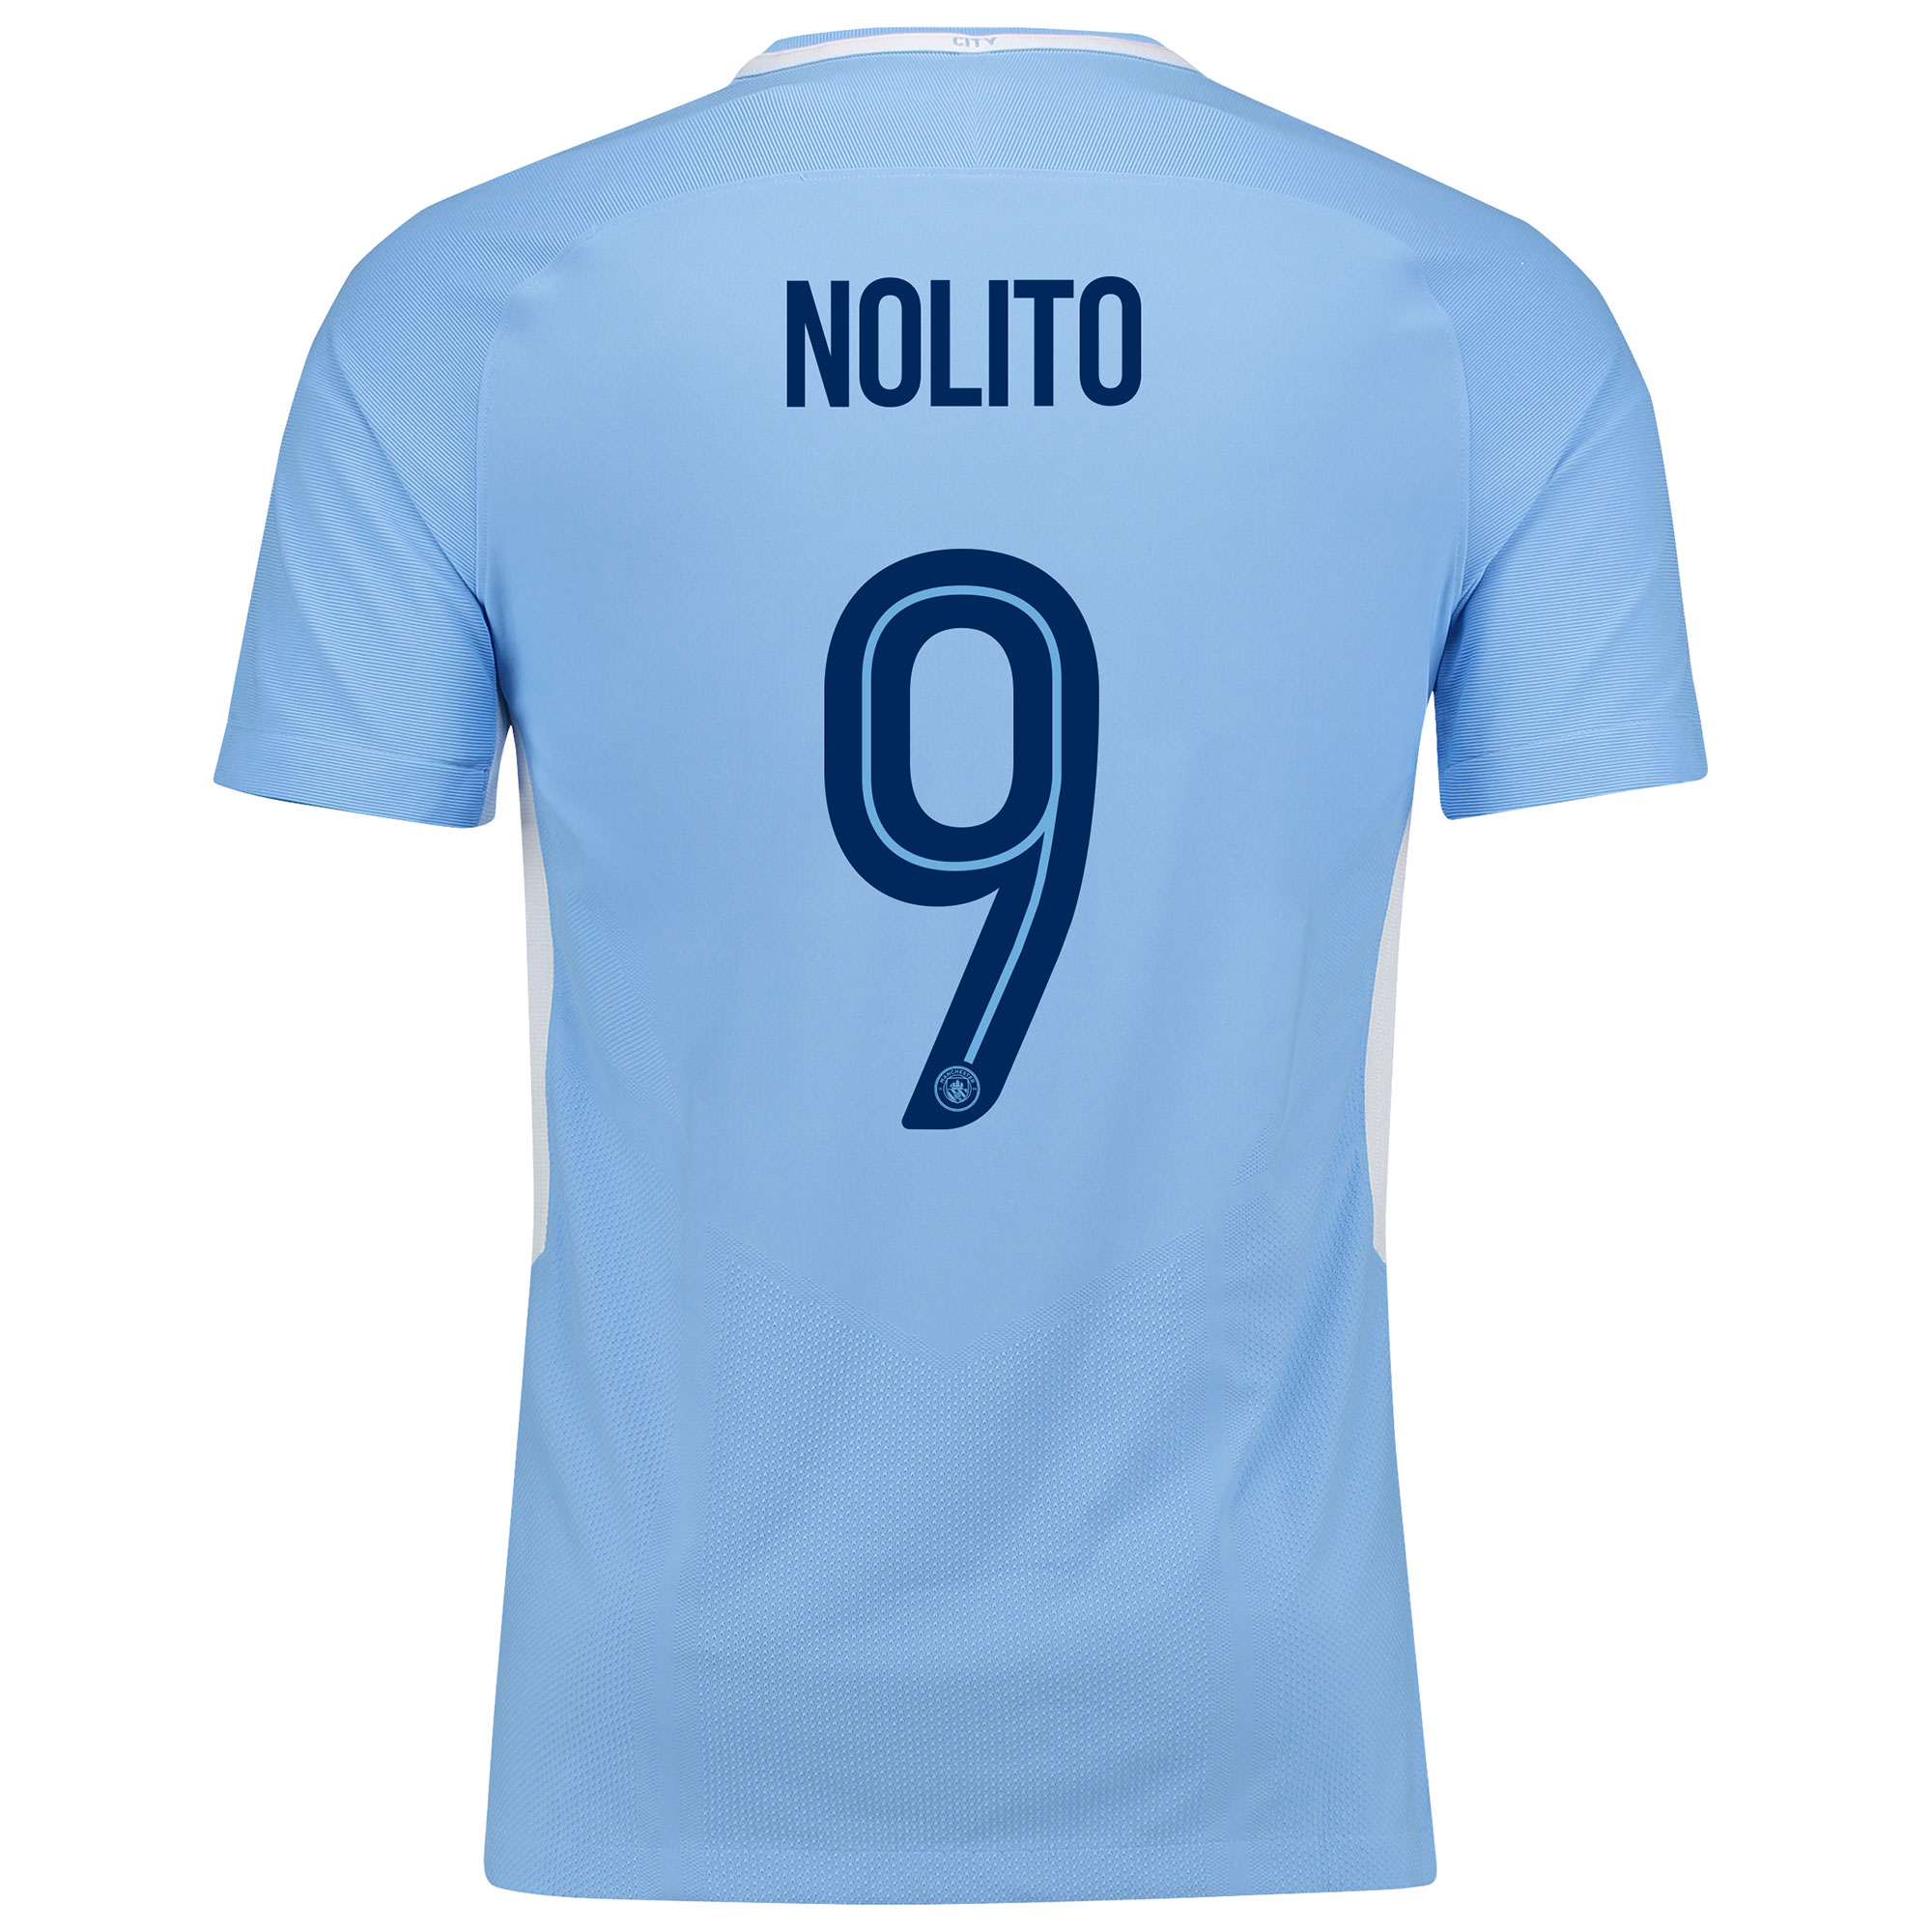 Manchester City Home Vapor Match Cup Shirt 2017-18 with Nolito 9 print